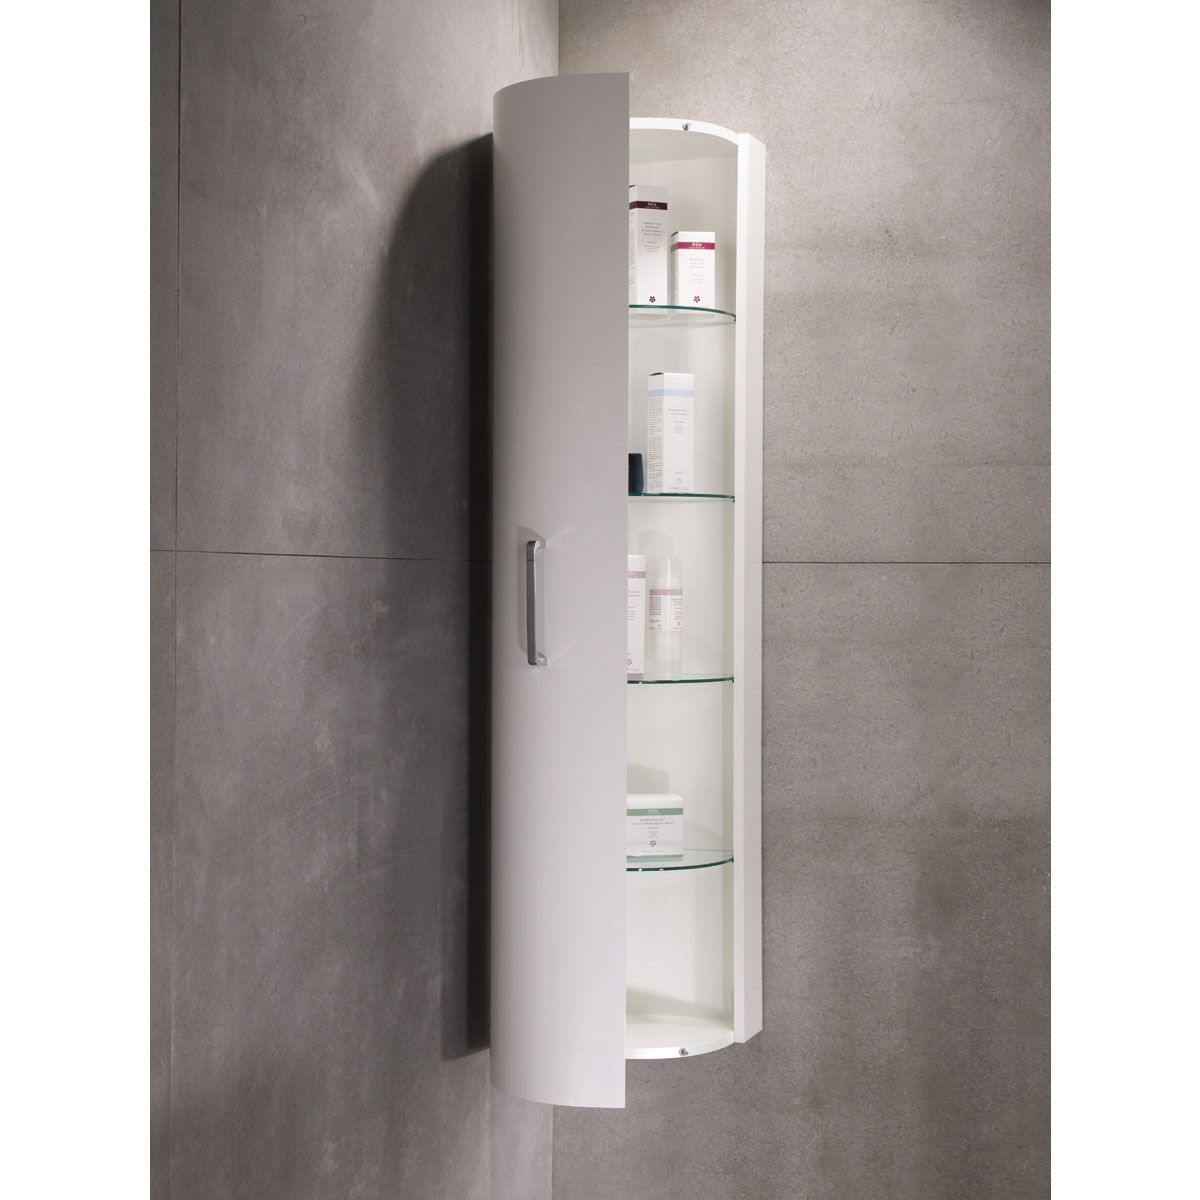 Wall Corner Cabinet Bathroom  Httpbetdaffaires  Pinterest Fair Small Corner Wall Cabinet For Bathroom 2018